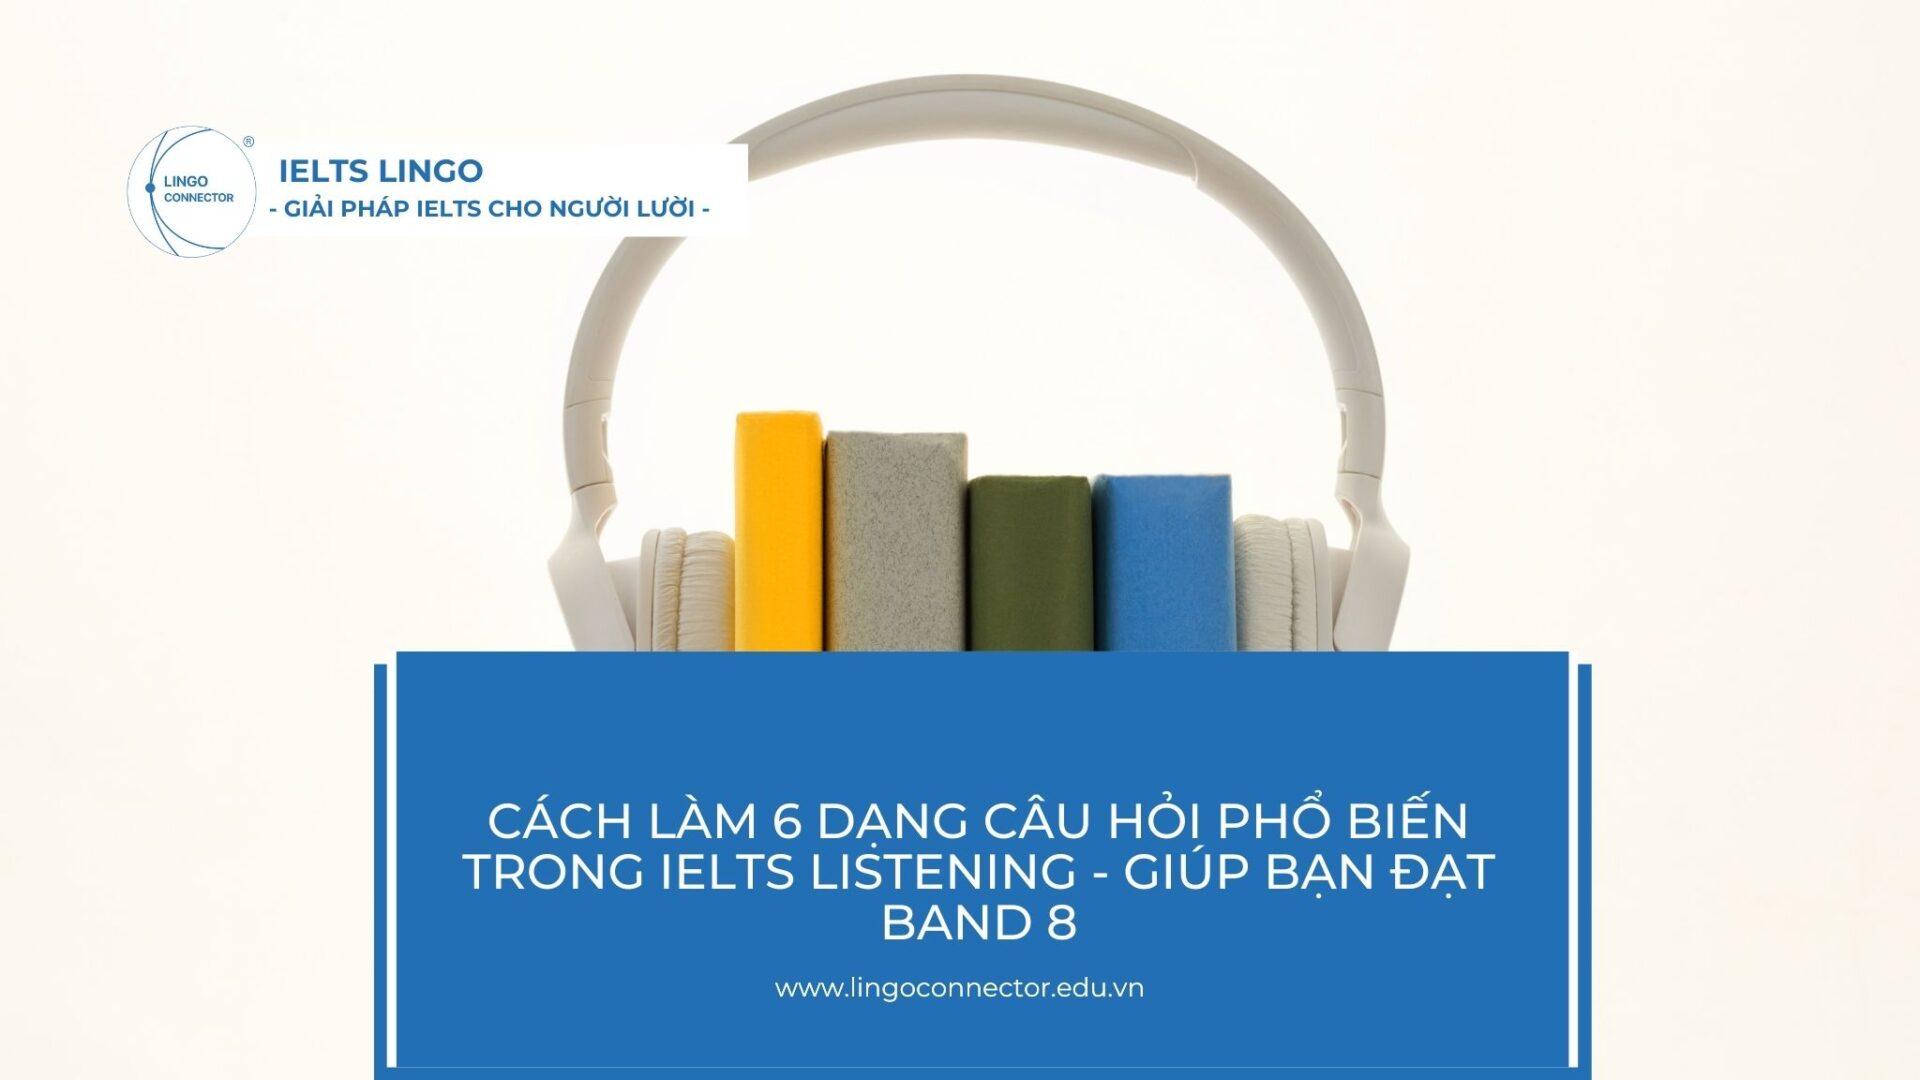 6-dang-cau-hoi-ielts-listening